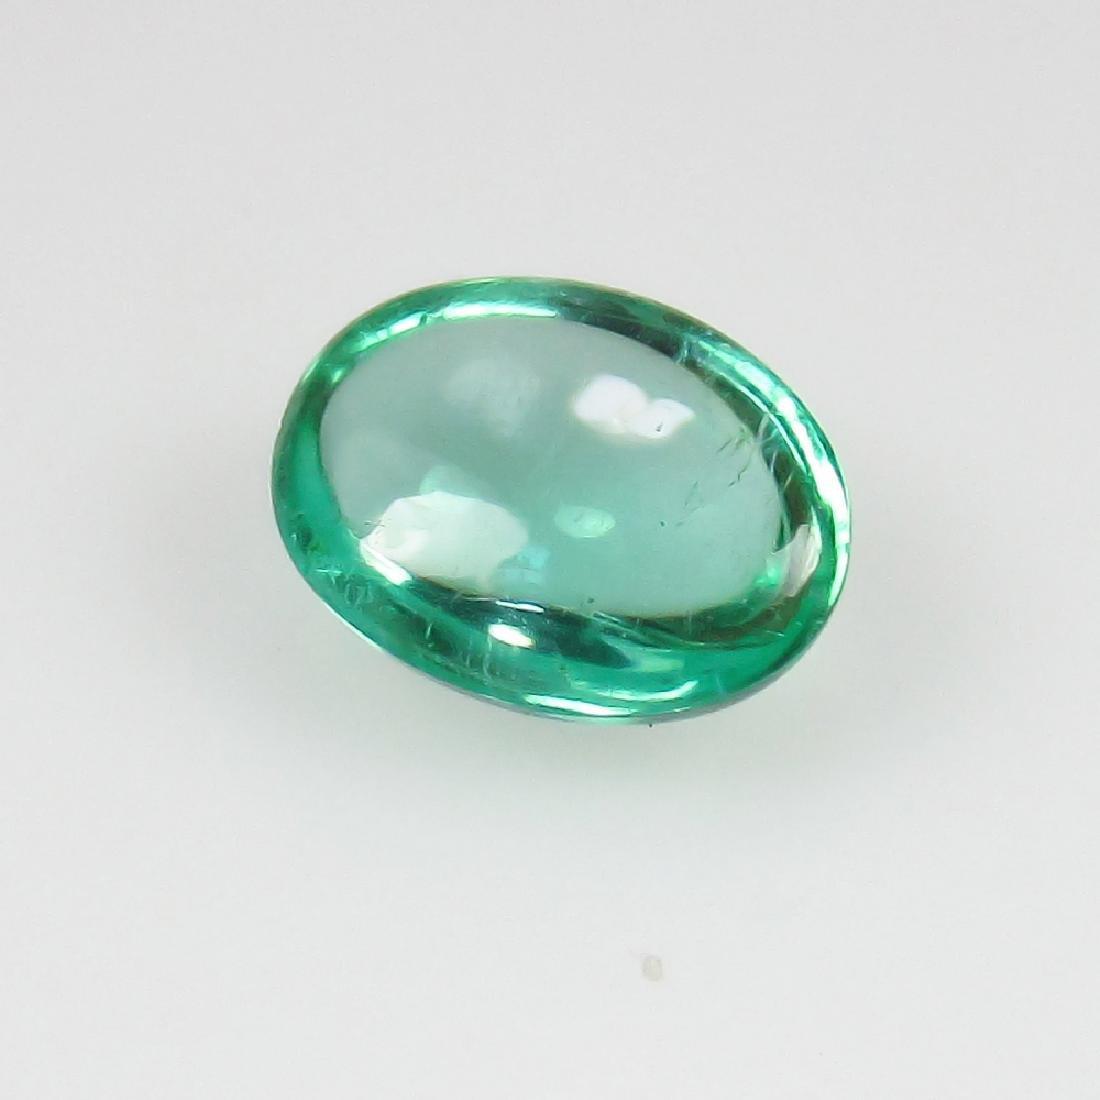 0.77 Ct Genuine Zambian Emerald Nice Oval Cabochon - 2